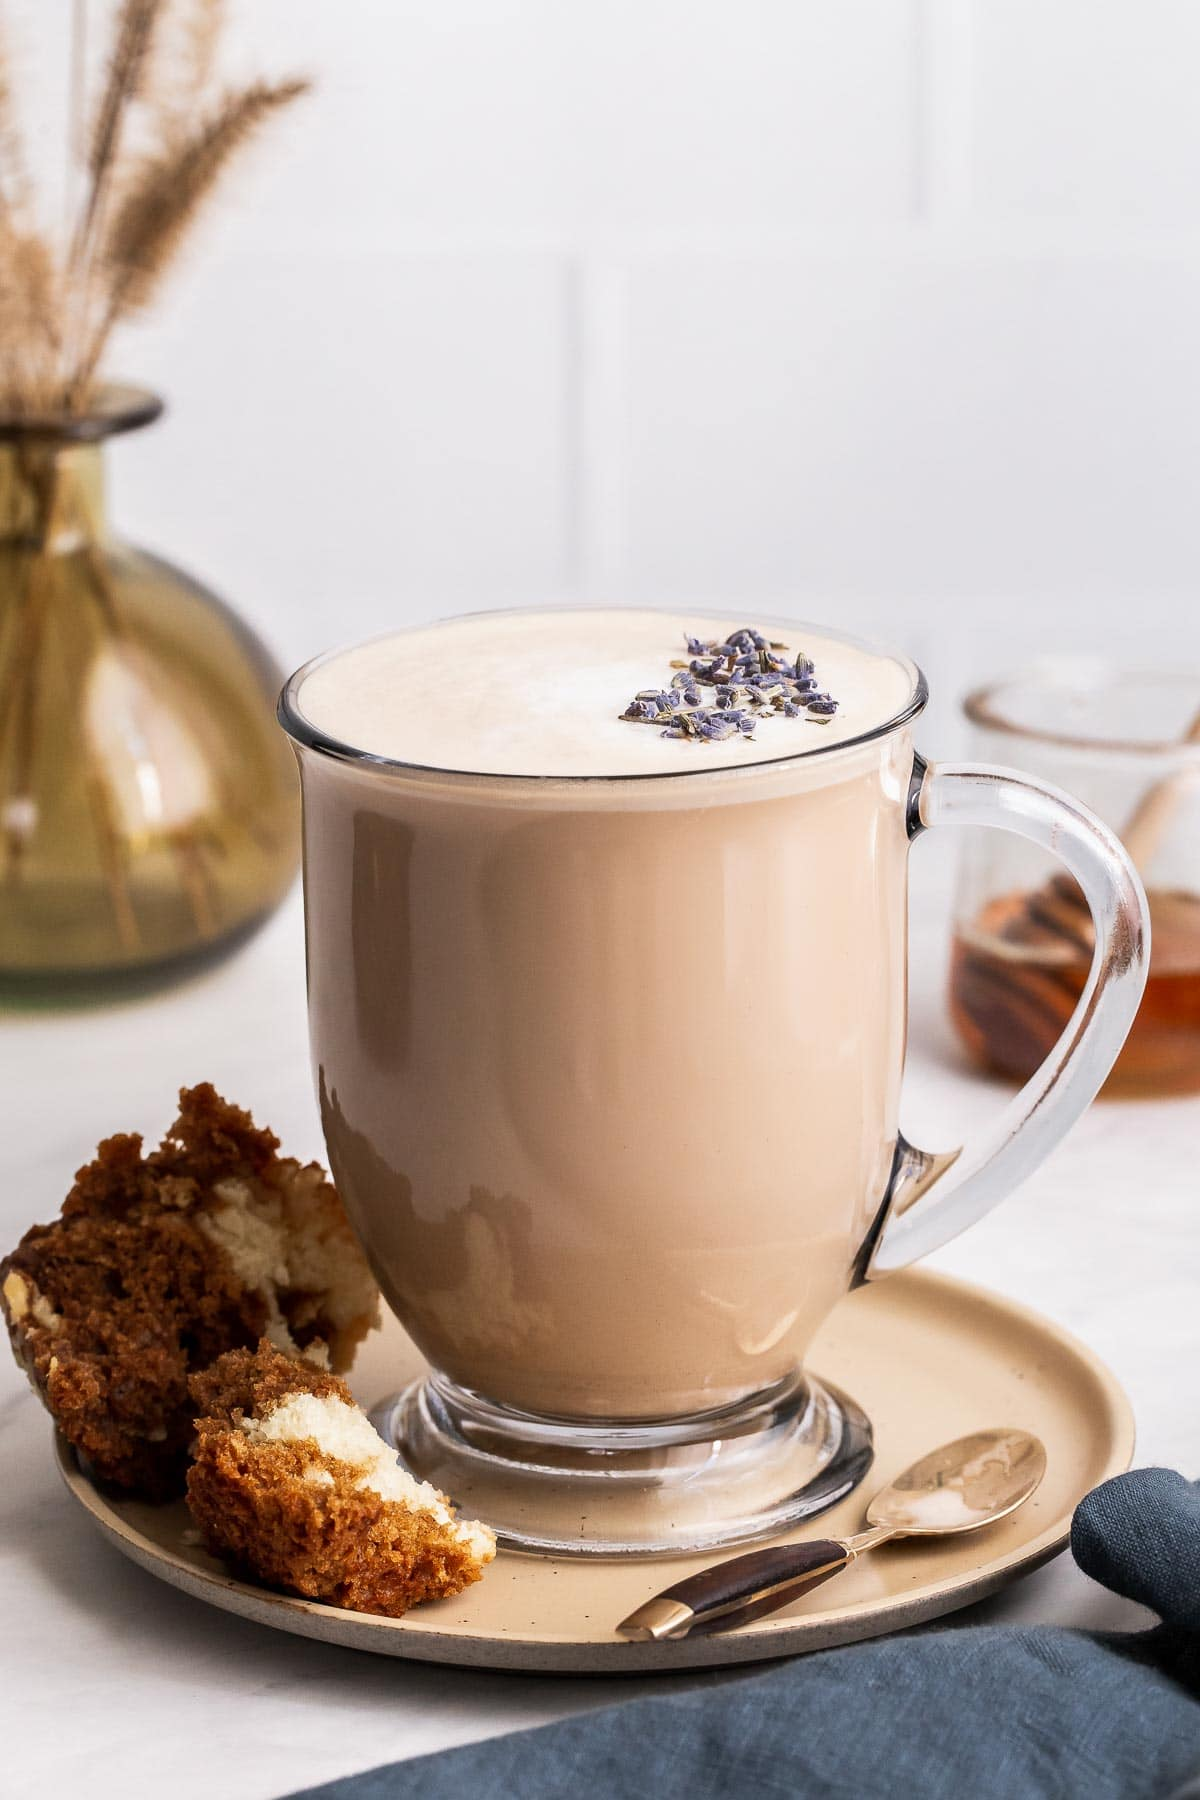 London fog tea latte in clear glass mug with lavender buds.